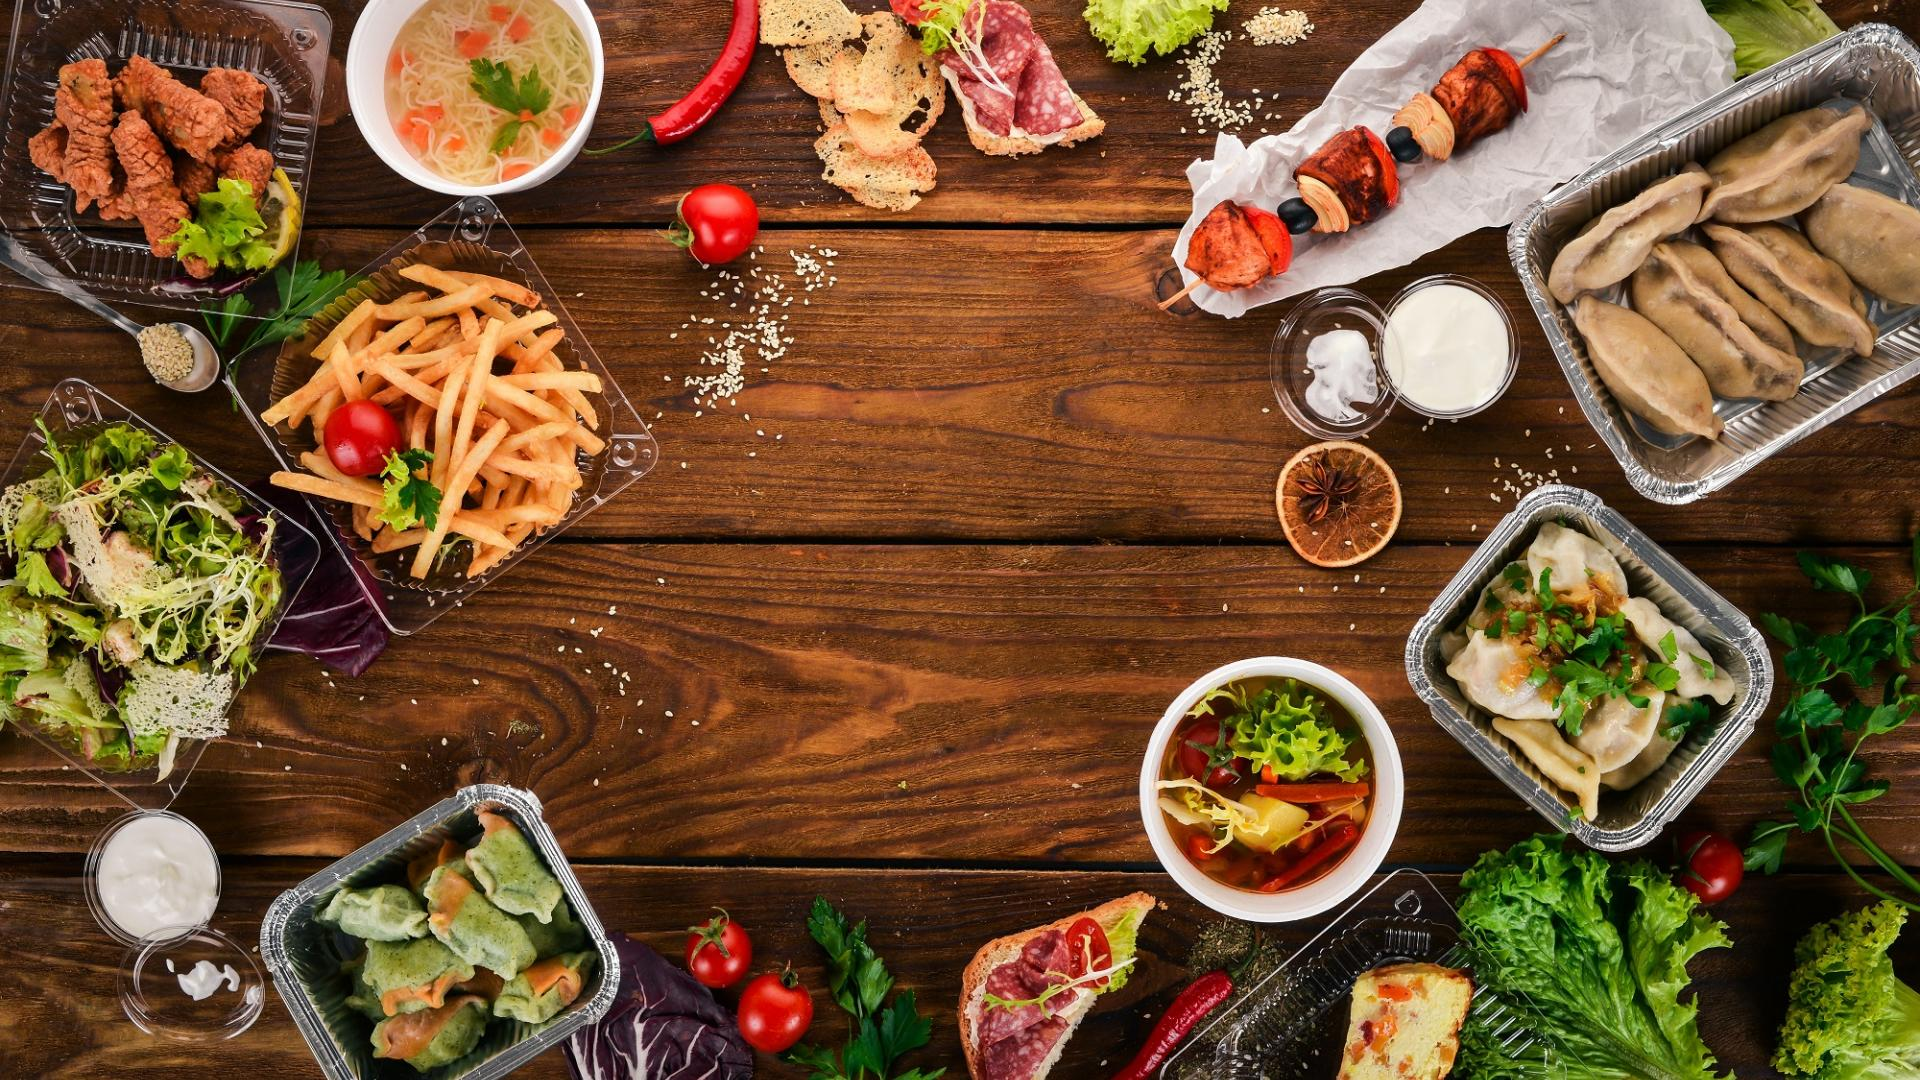 Essen Verpackungen Tisch